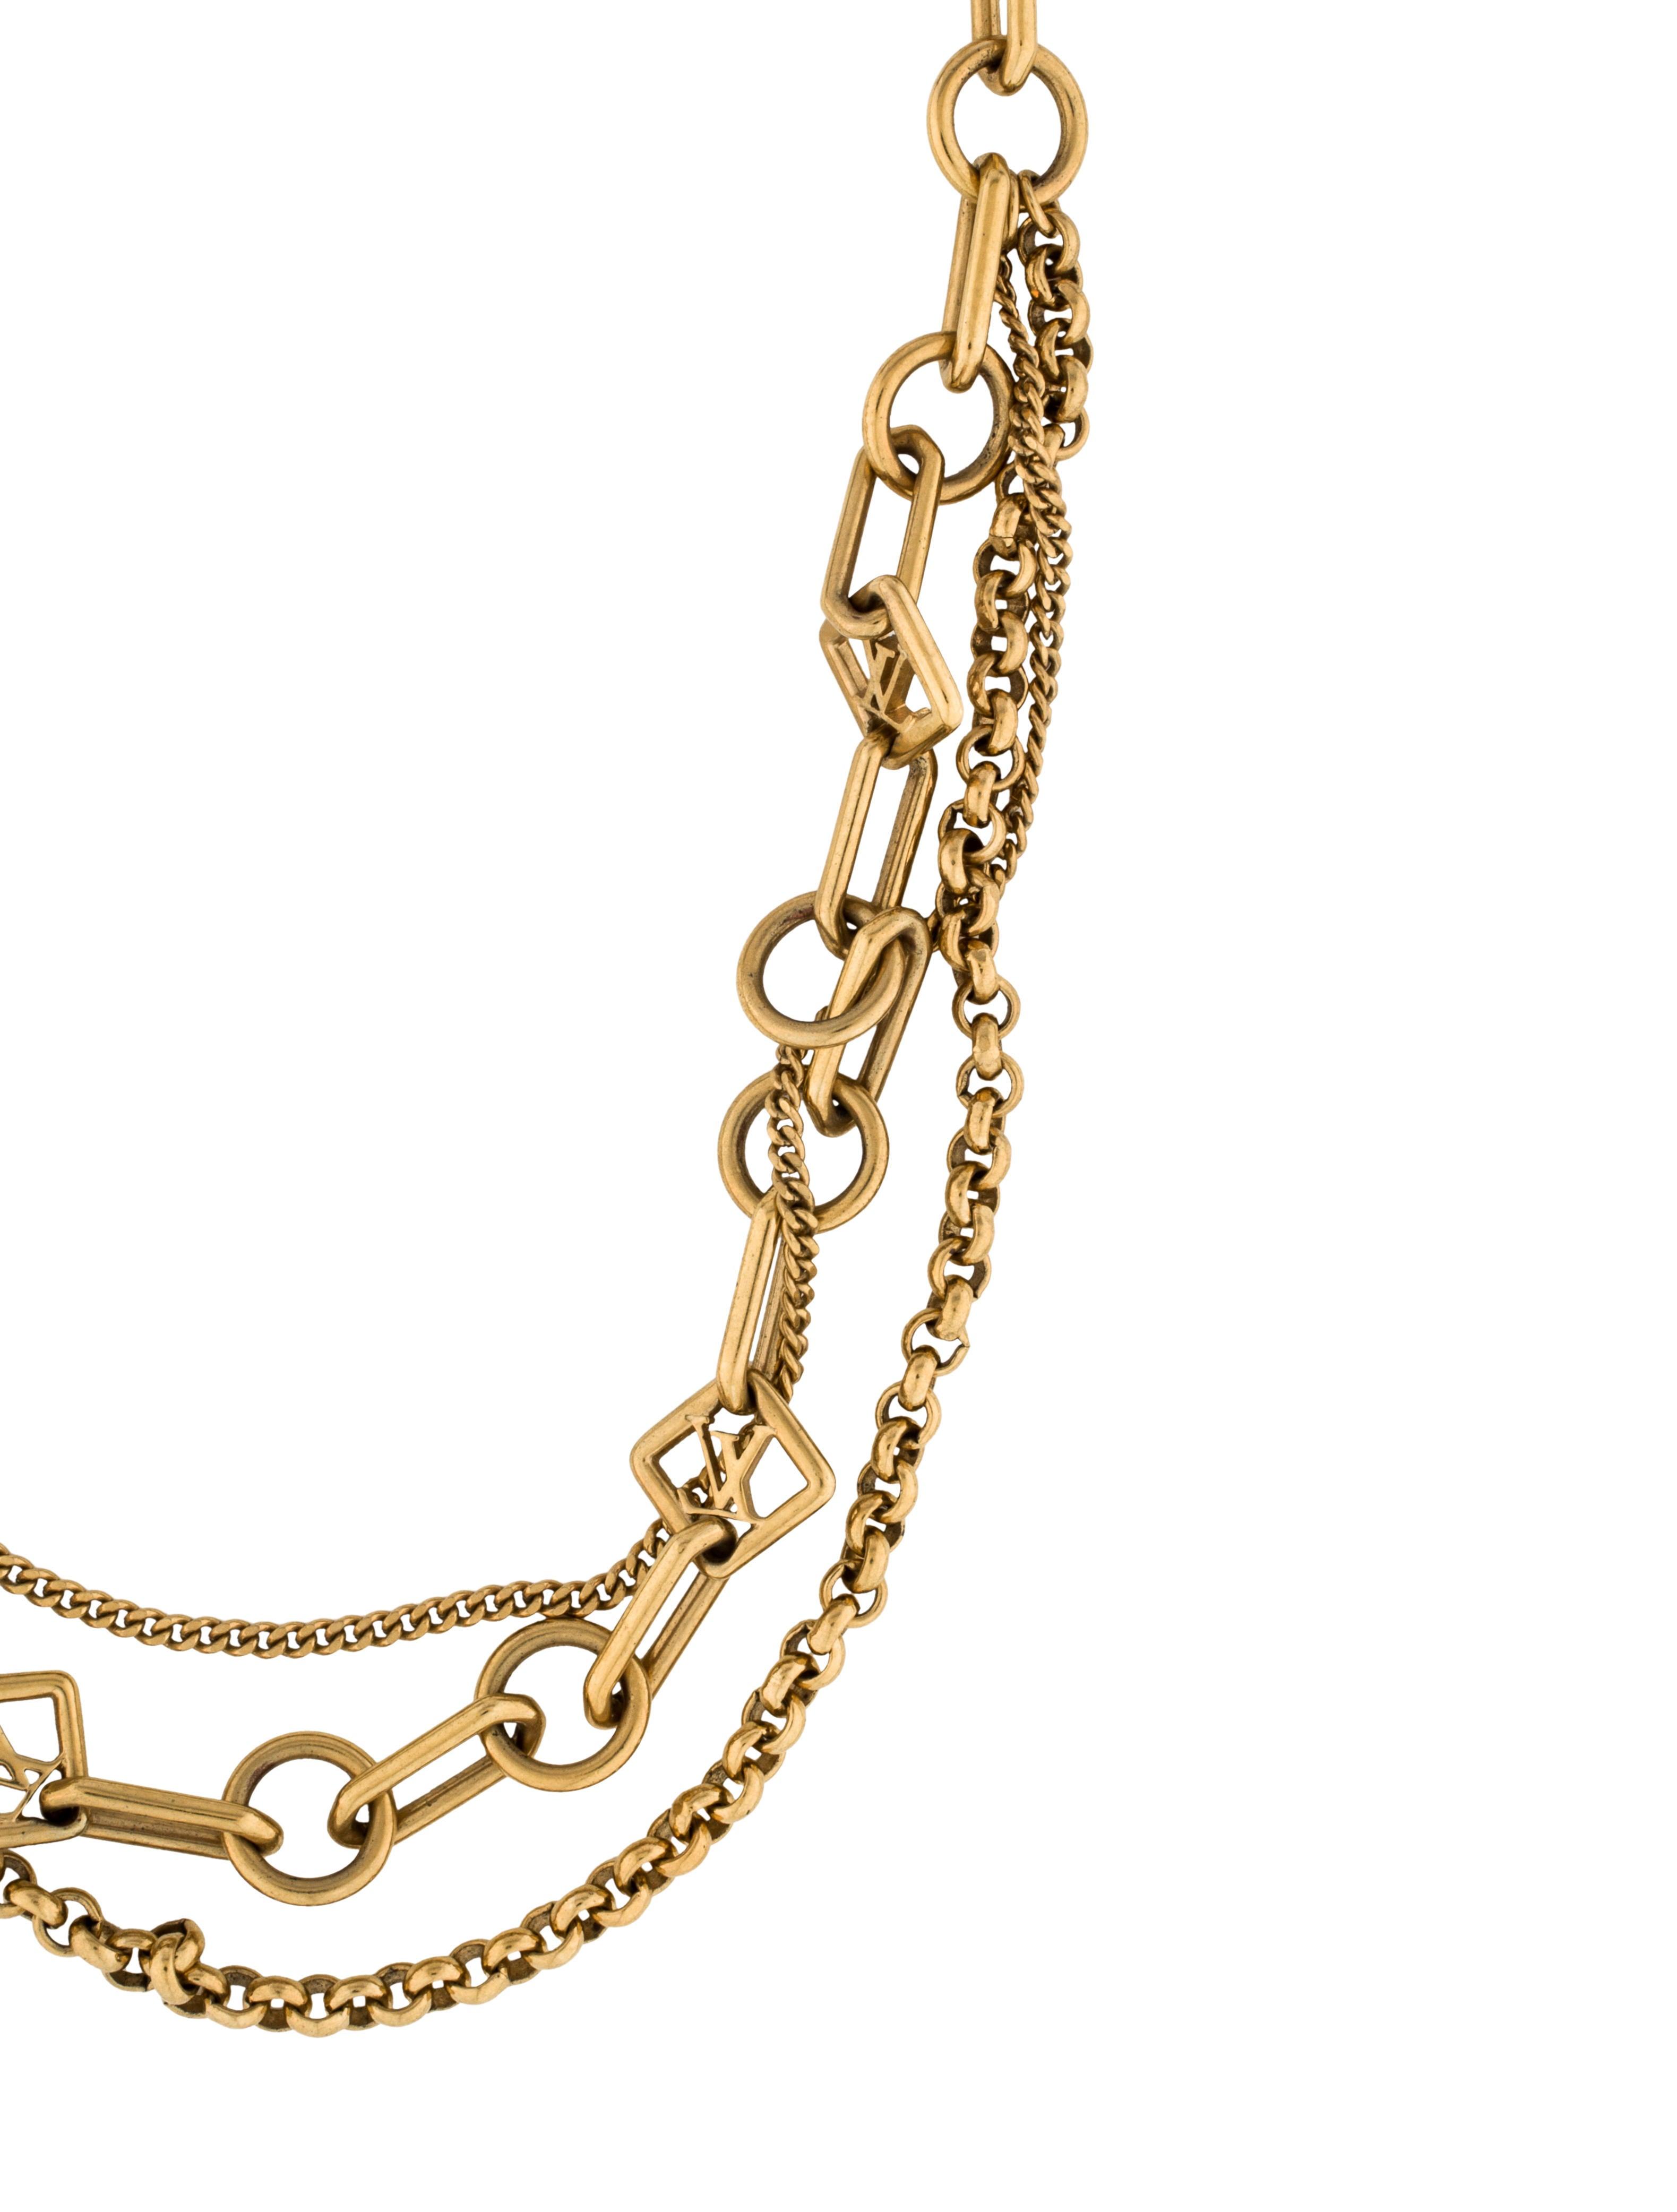 Louis Vuitton Collier Chaine Vegas Necklace  Necklaces. Exotic Engagement Rings. Art Deco Pendant. Flower Lockets. Tire Rings. Single Bangle. Synthetic Tanzanite. Moissanite Platinum. Flat Disc Stud Earrings